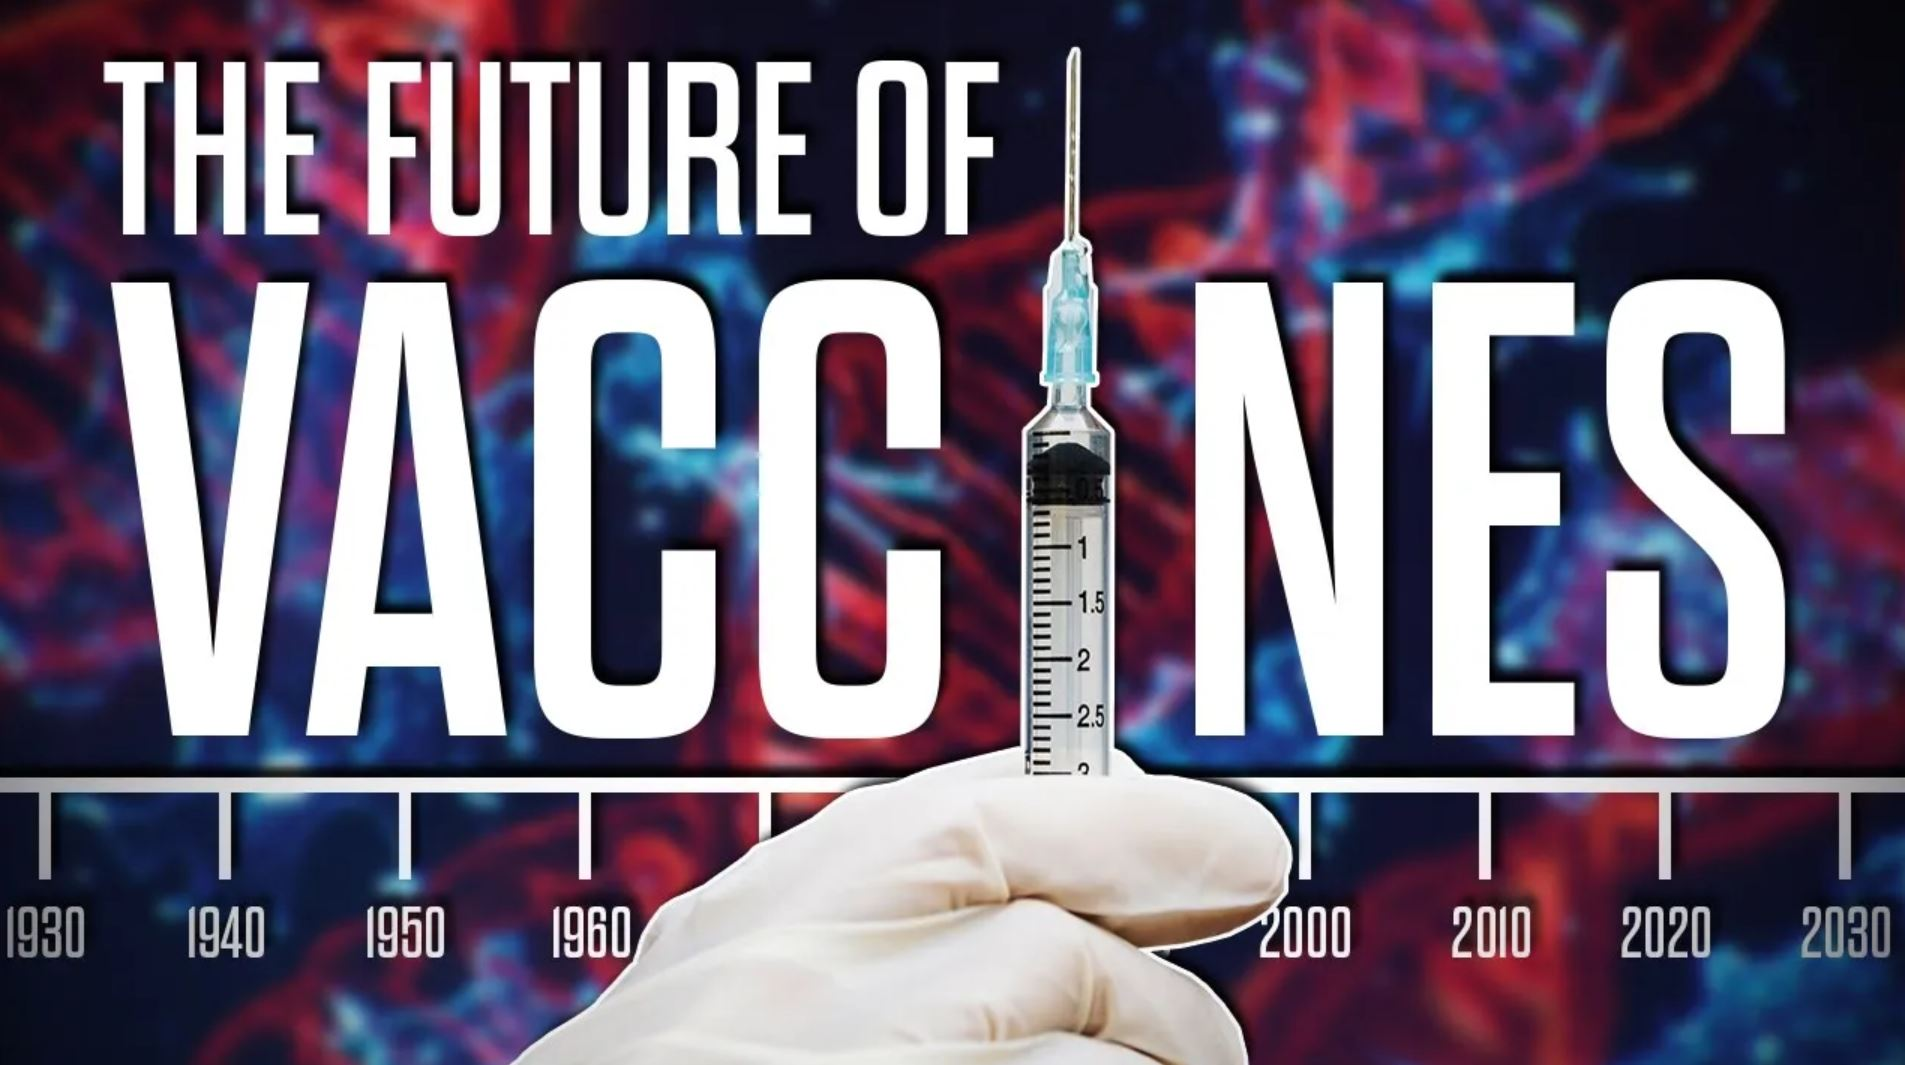 The Future of Vaccines – Activist Post